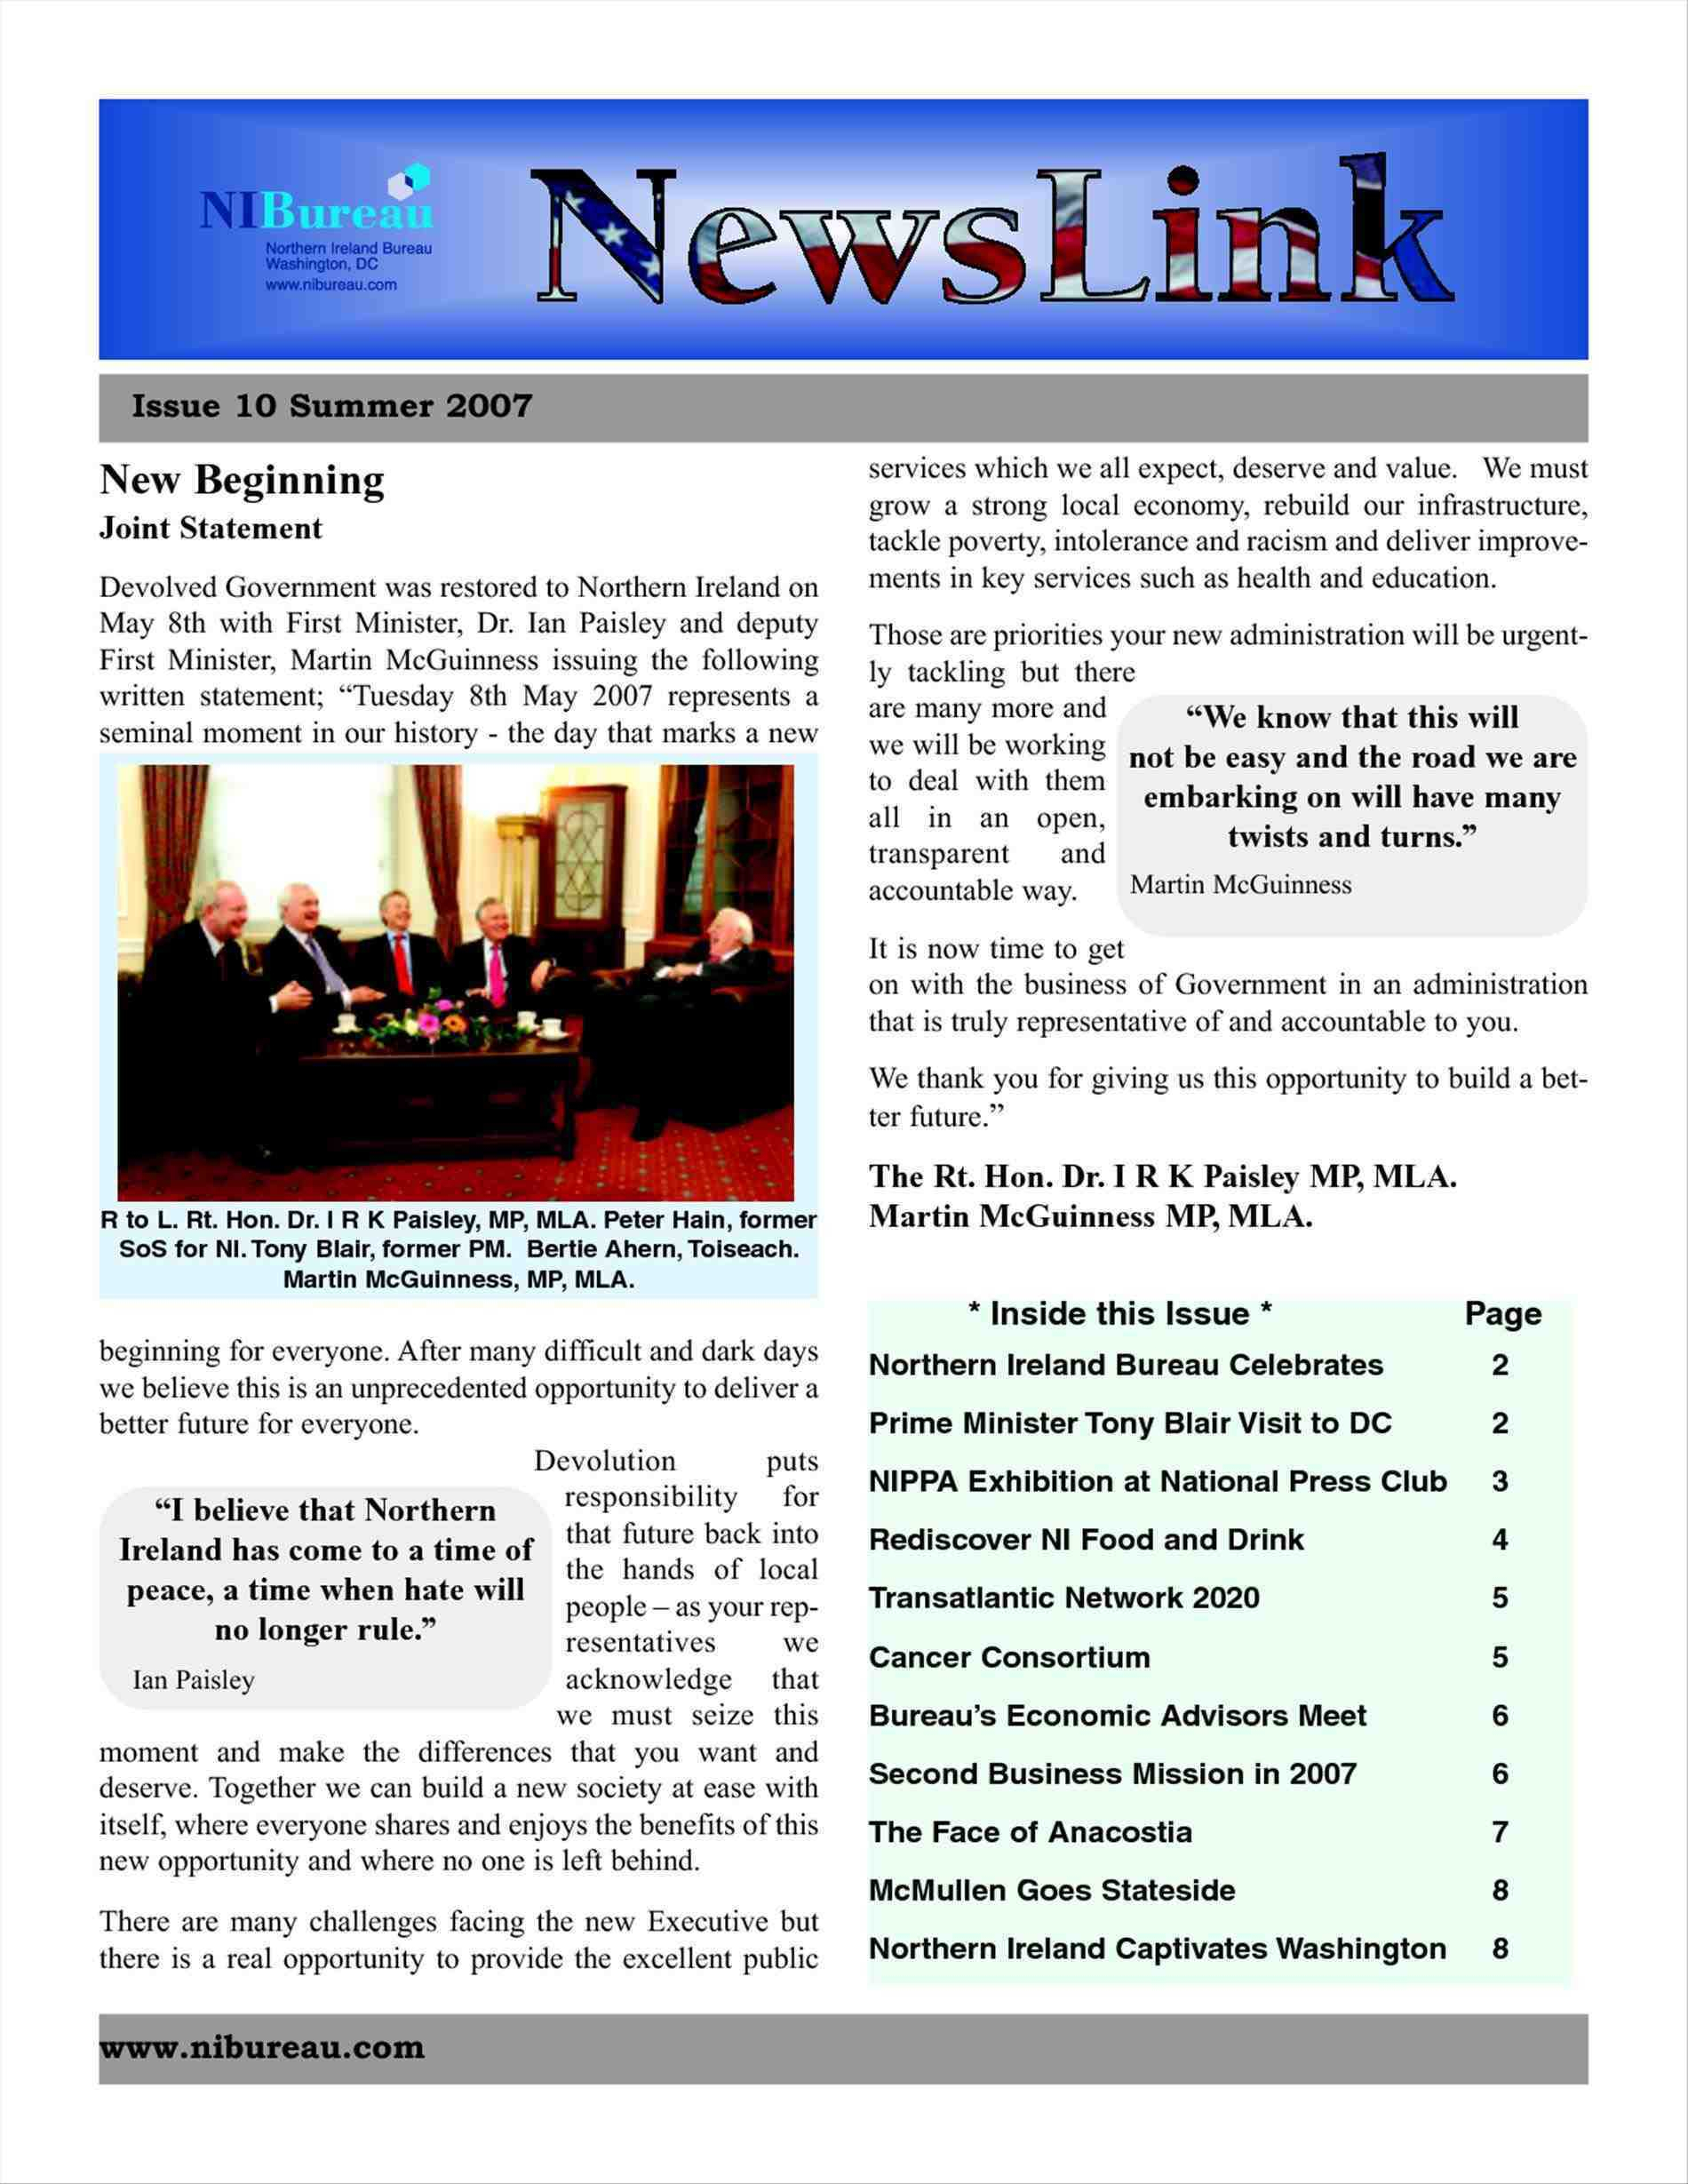 Mrea Business Planning Spreadsheet Within 9 New Mrea Business Planning Spreadsheet  Twables.site